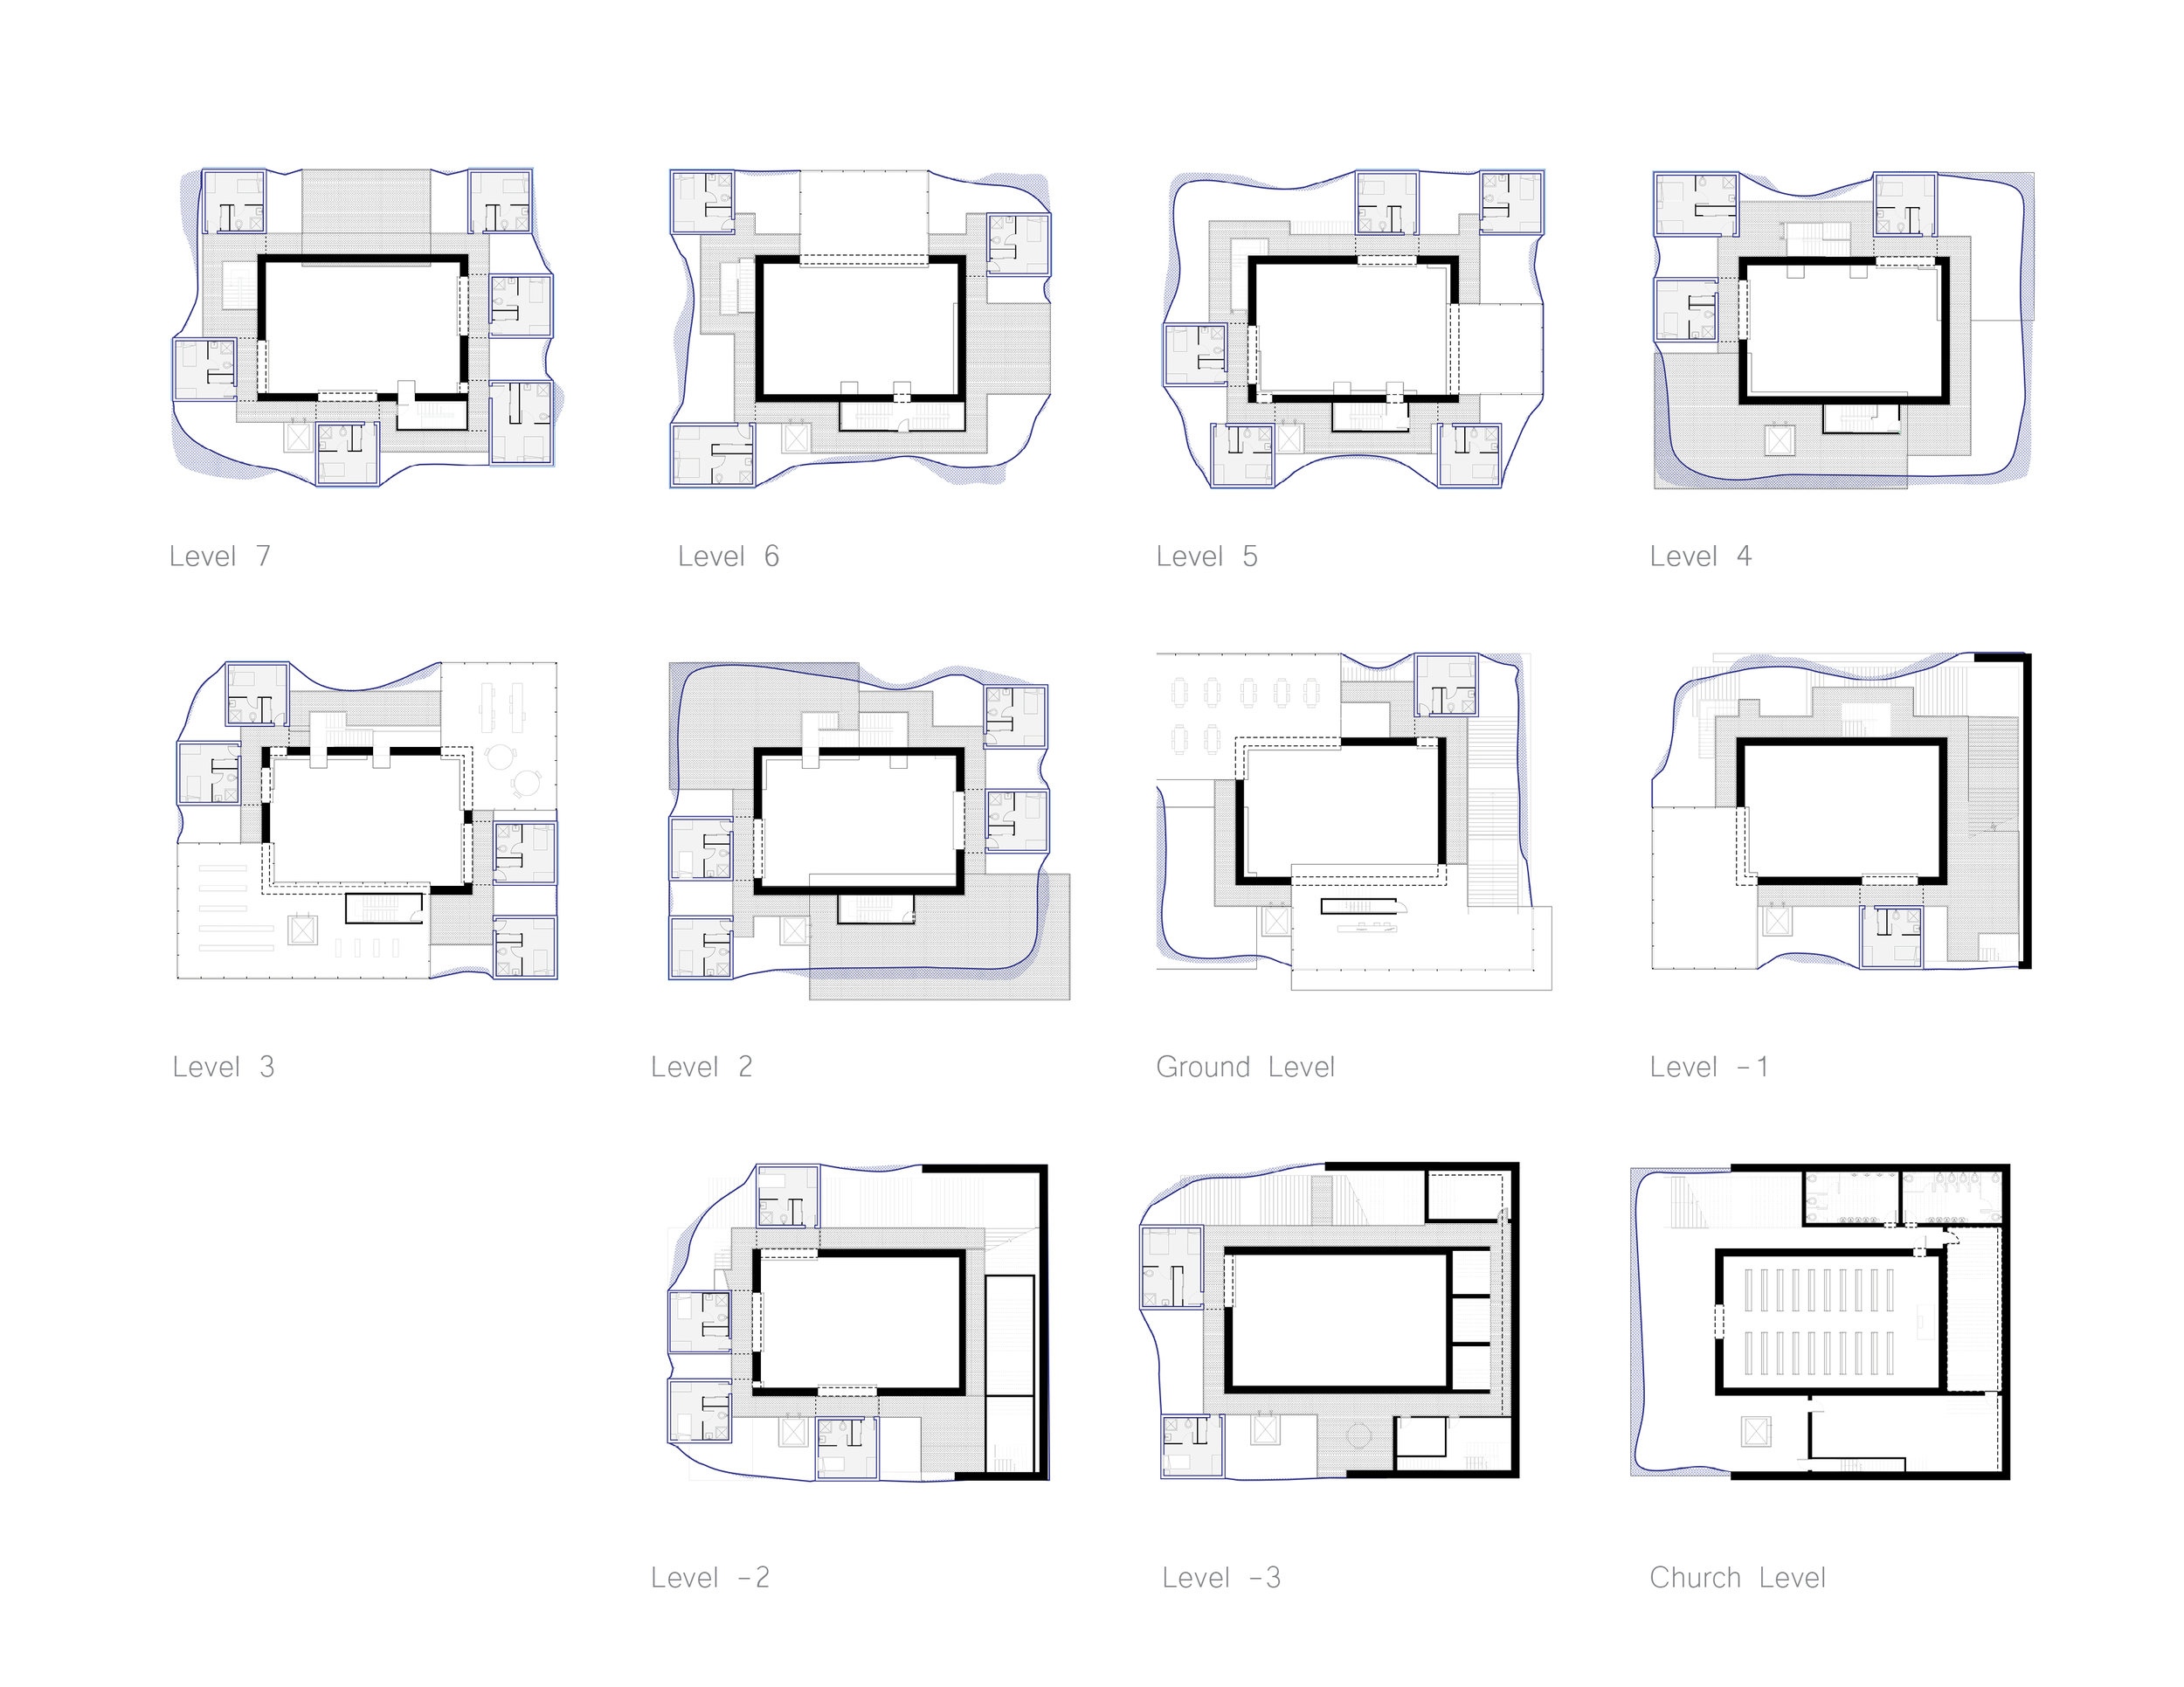 181122 Horizontal Plans.jpg